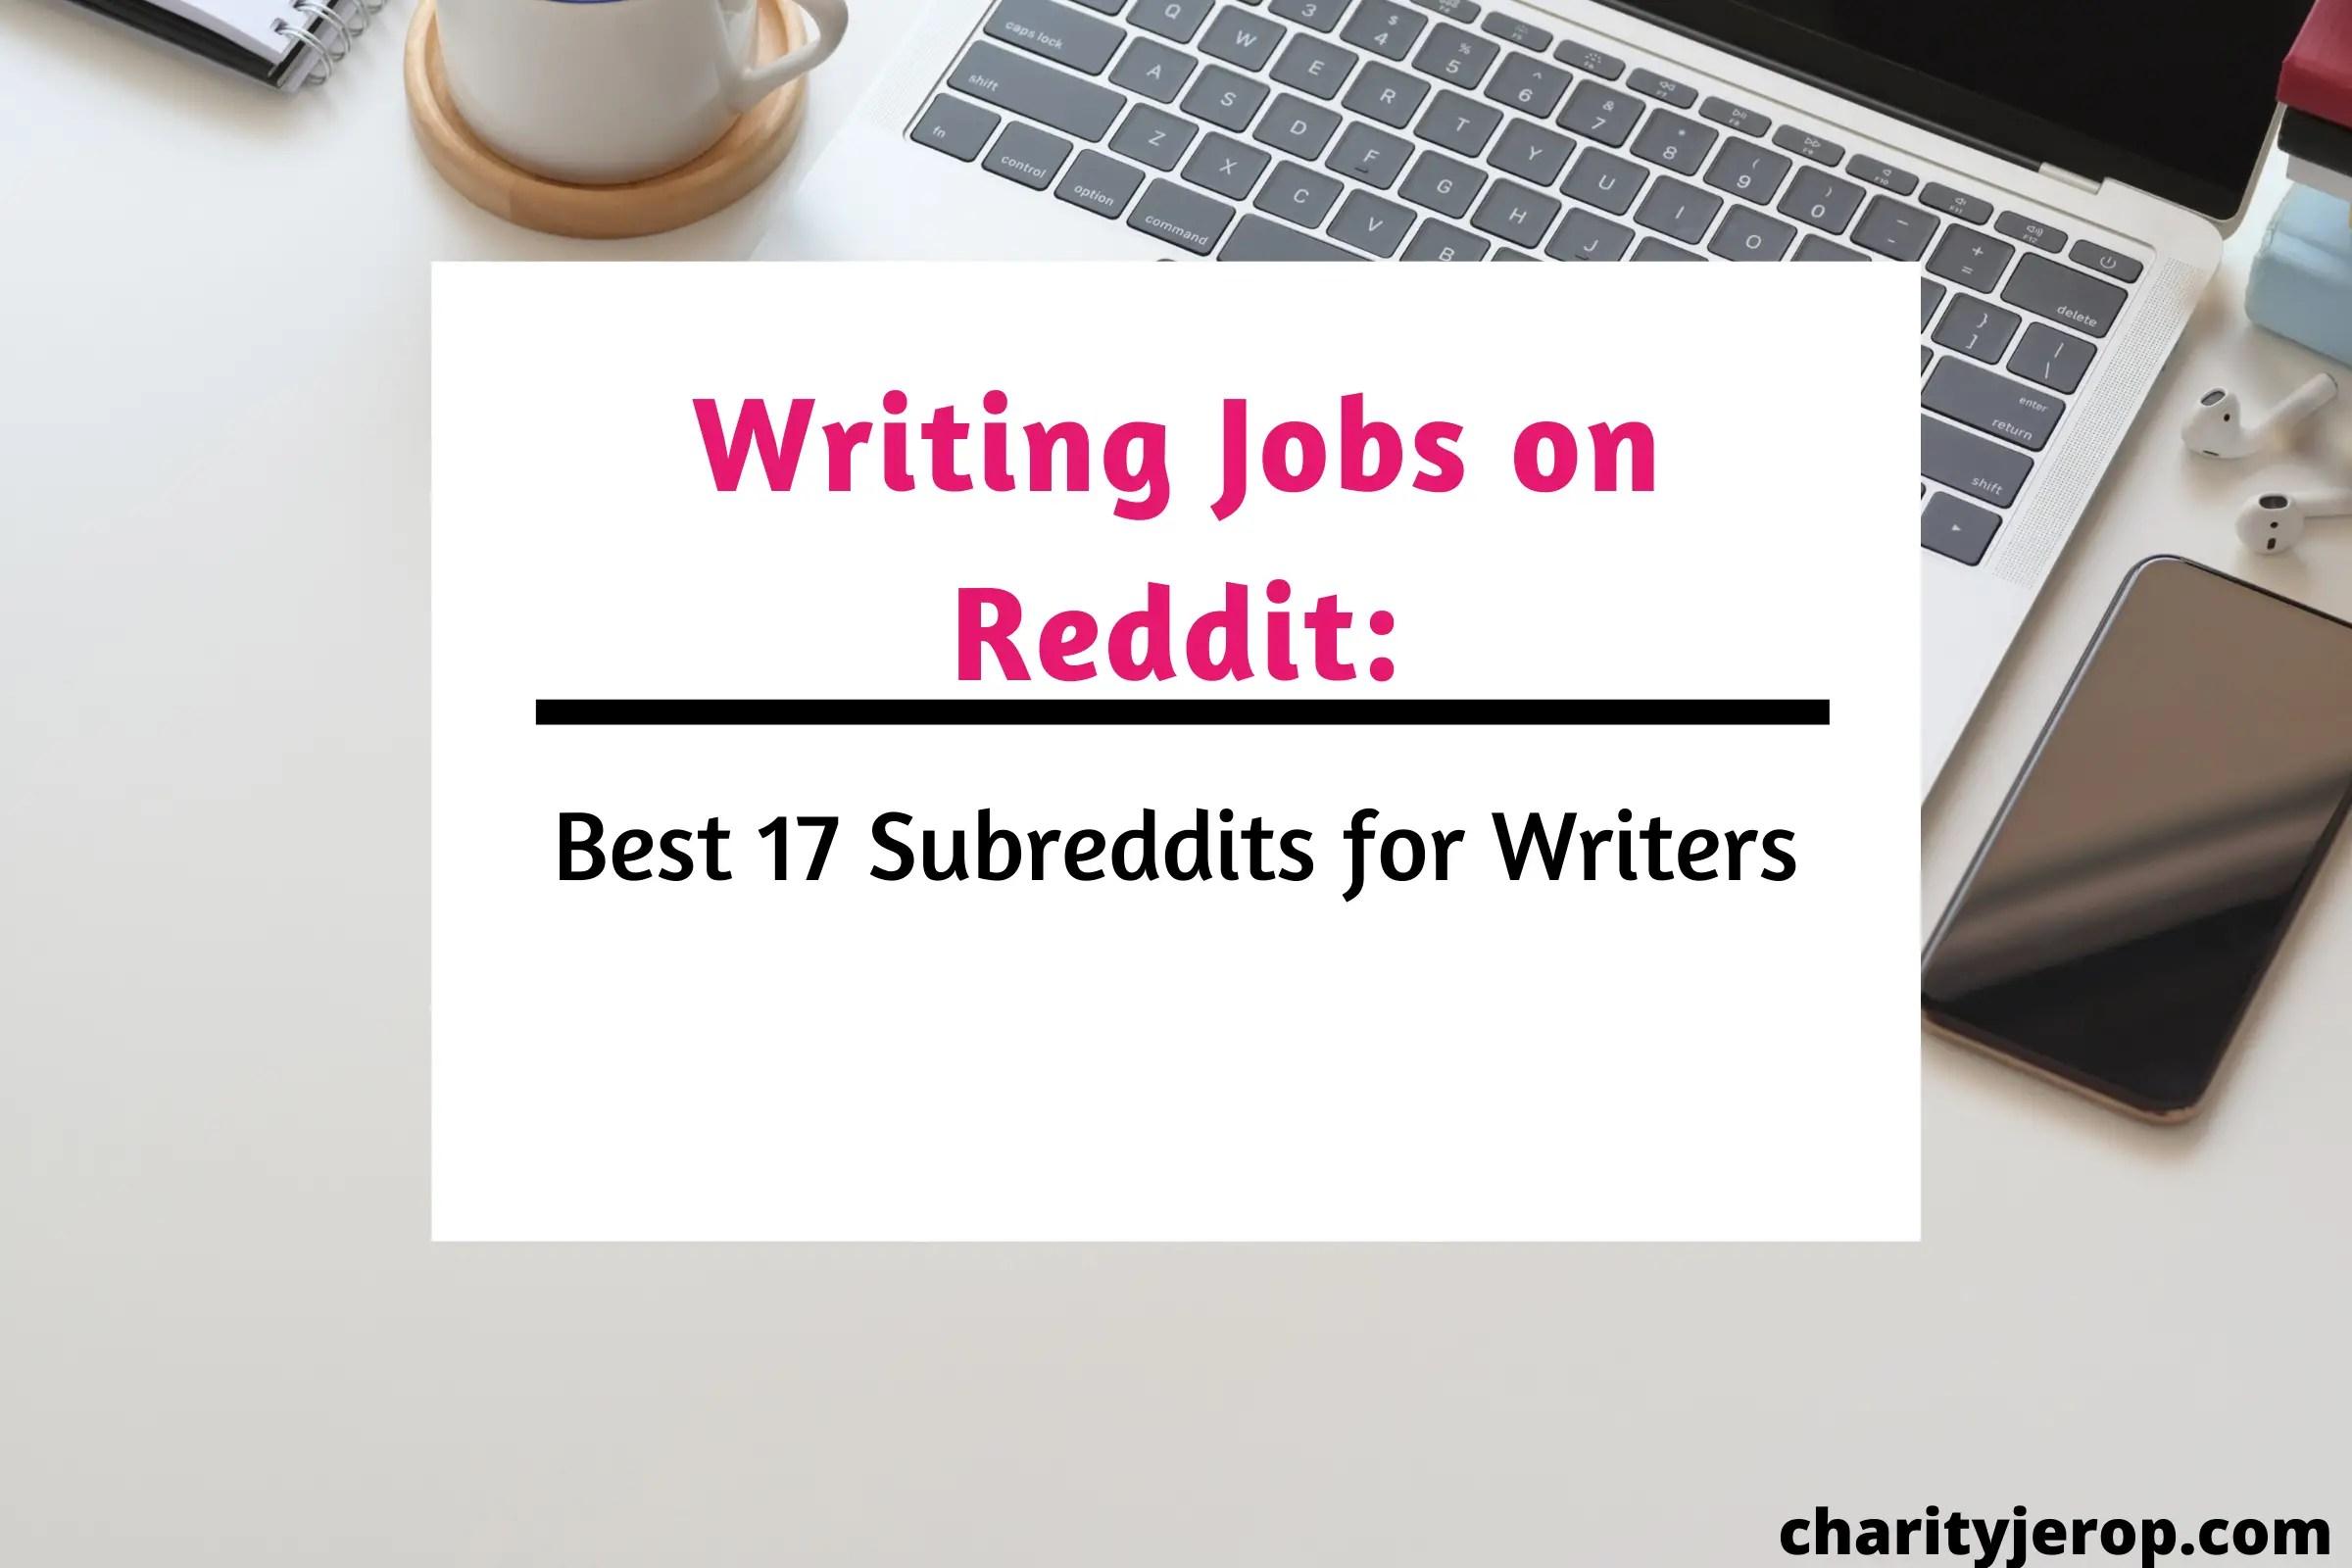 Writing jobs on reddit